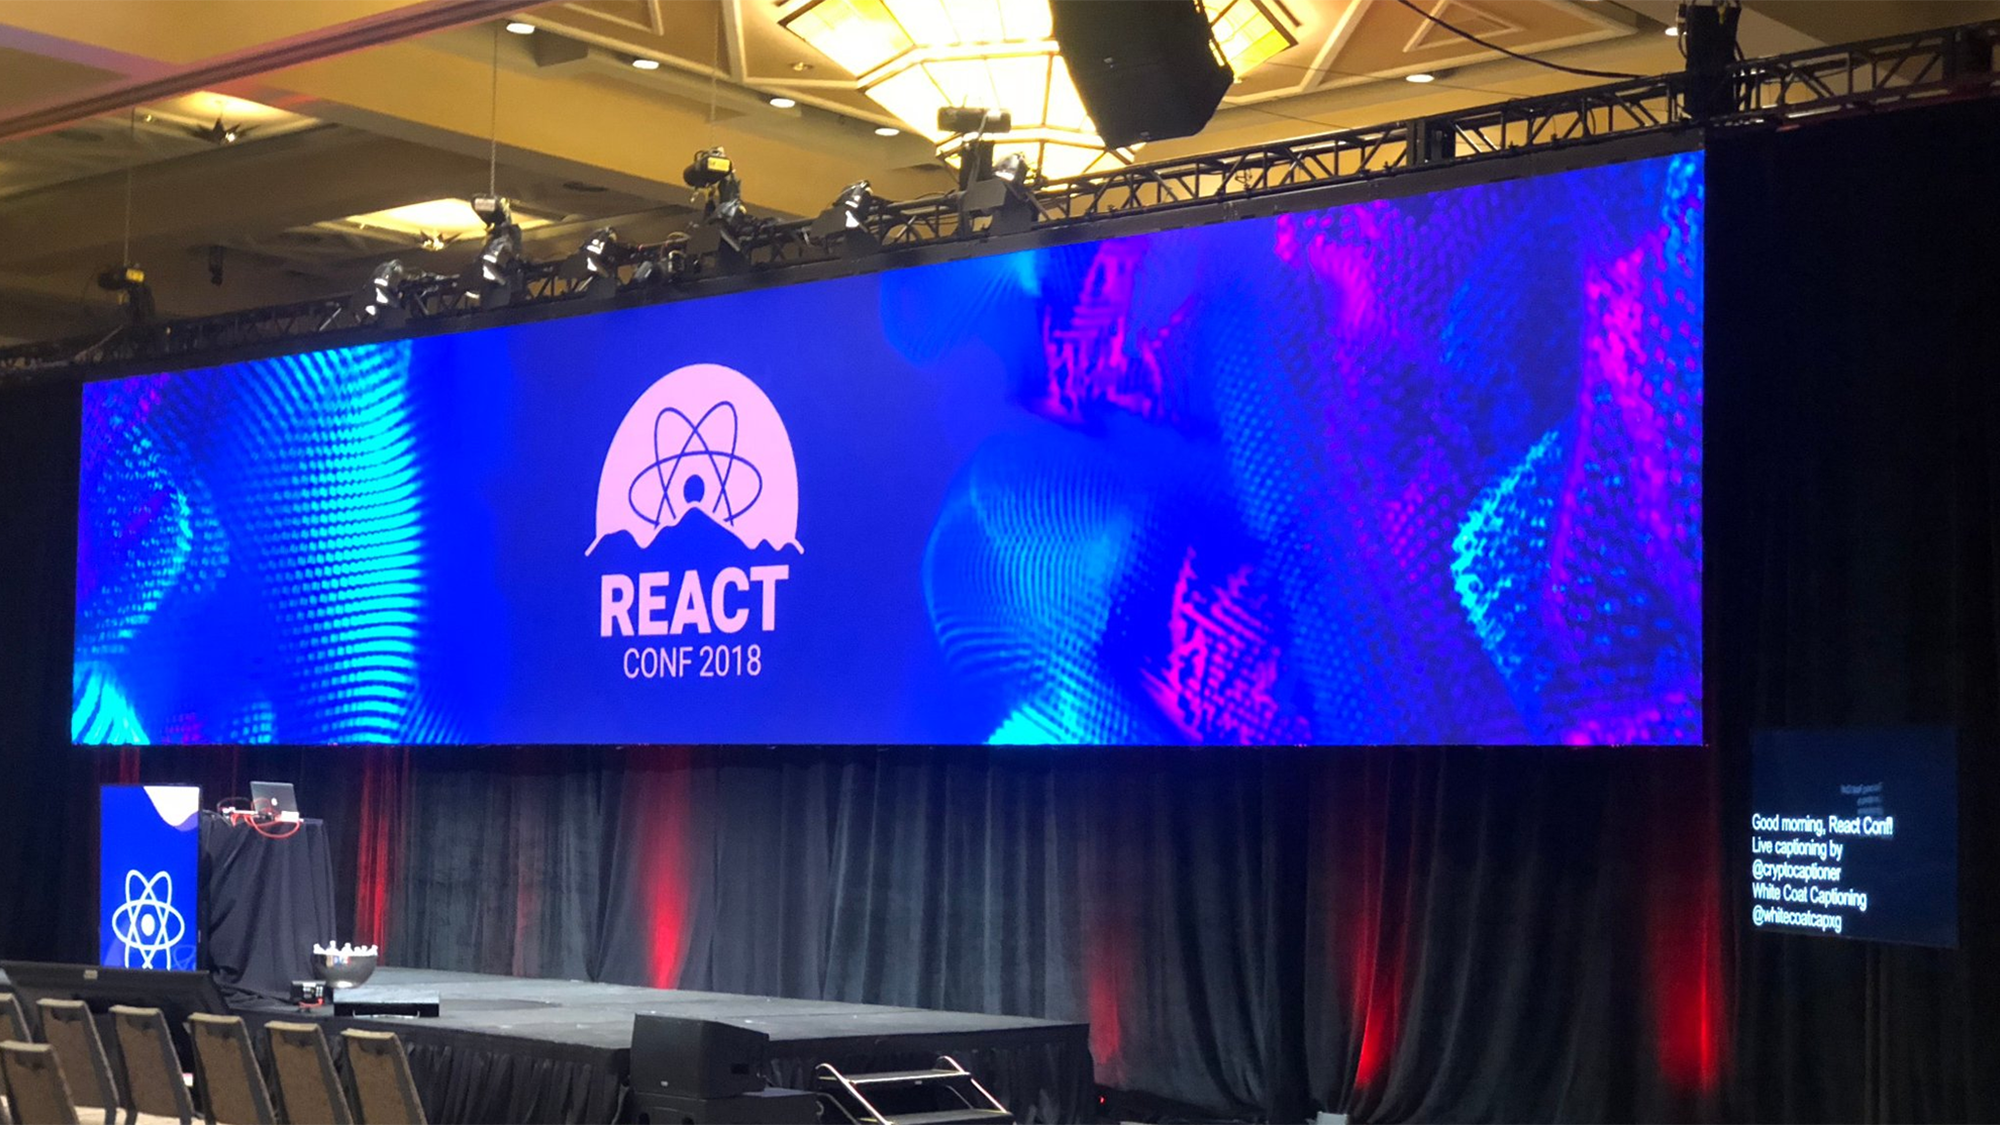 React Conf recap: Hooks, Suspense, and Concurrent Rendering on engineering.fb.com, Facebook's Engineering blog